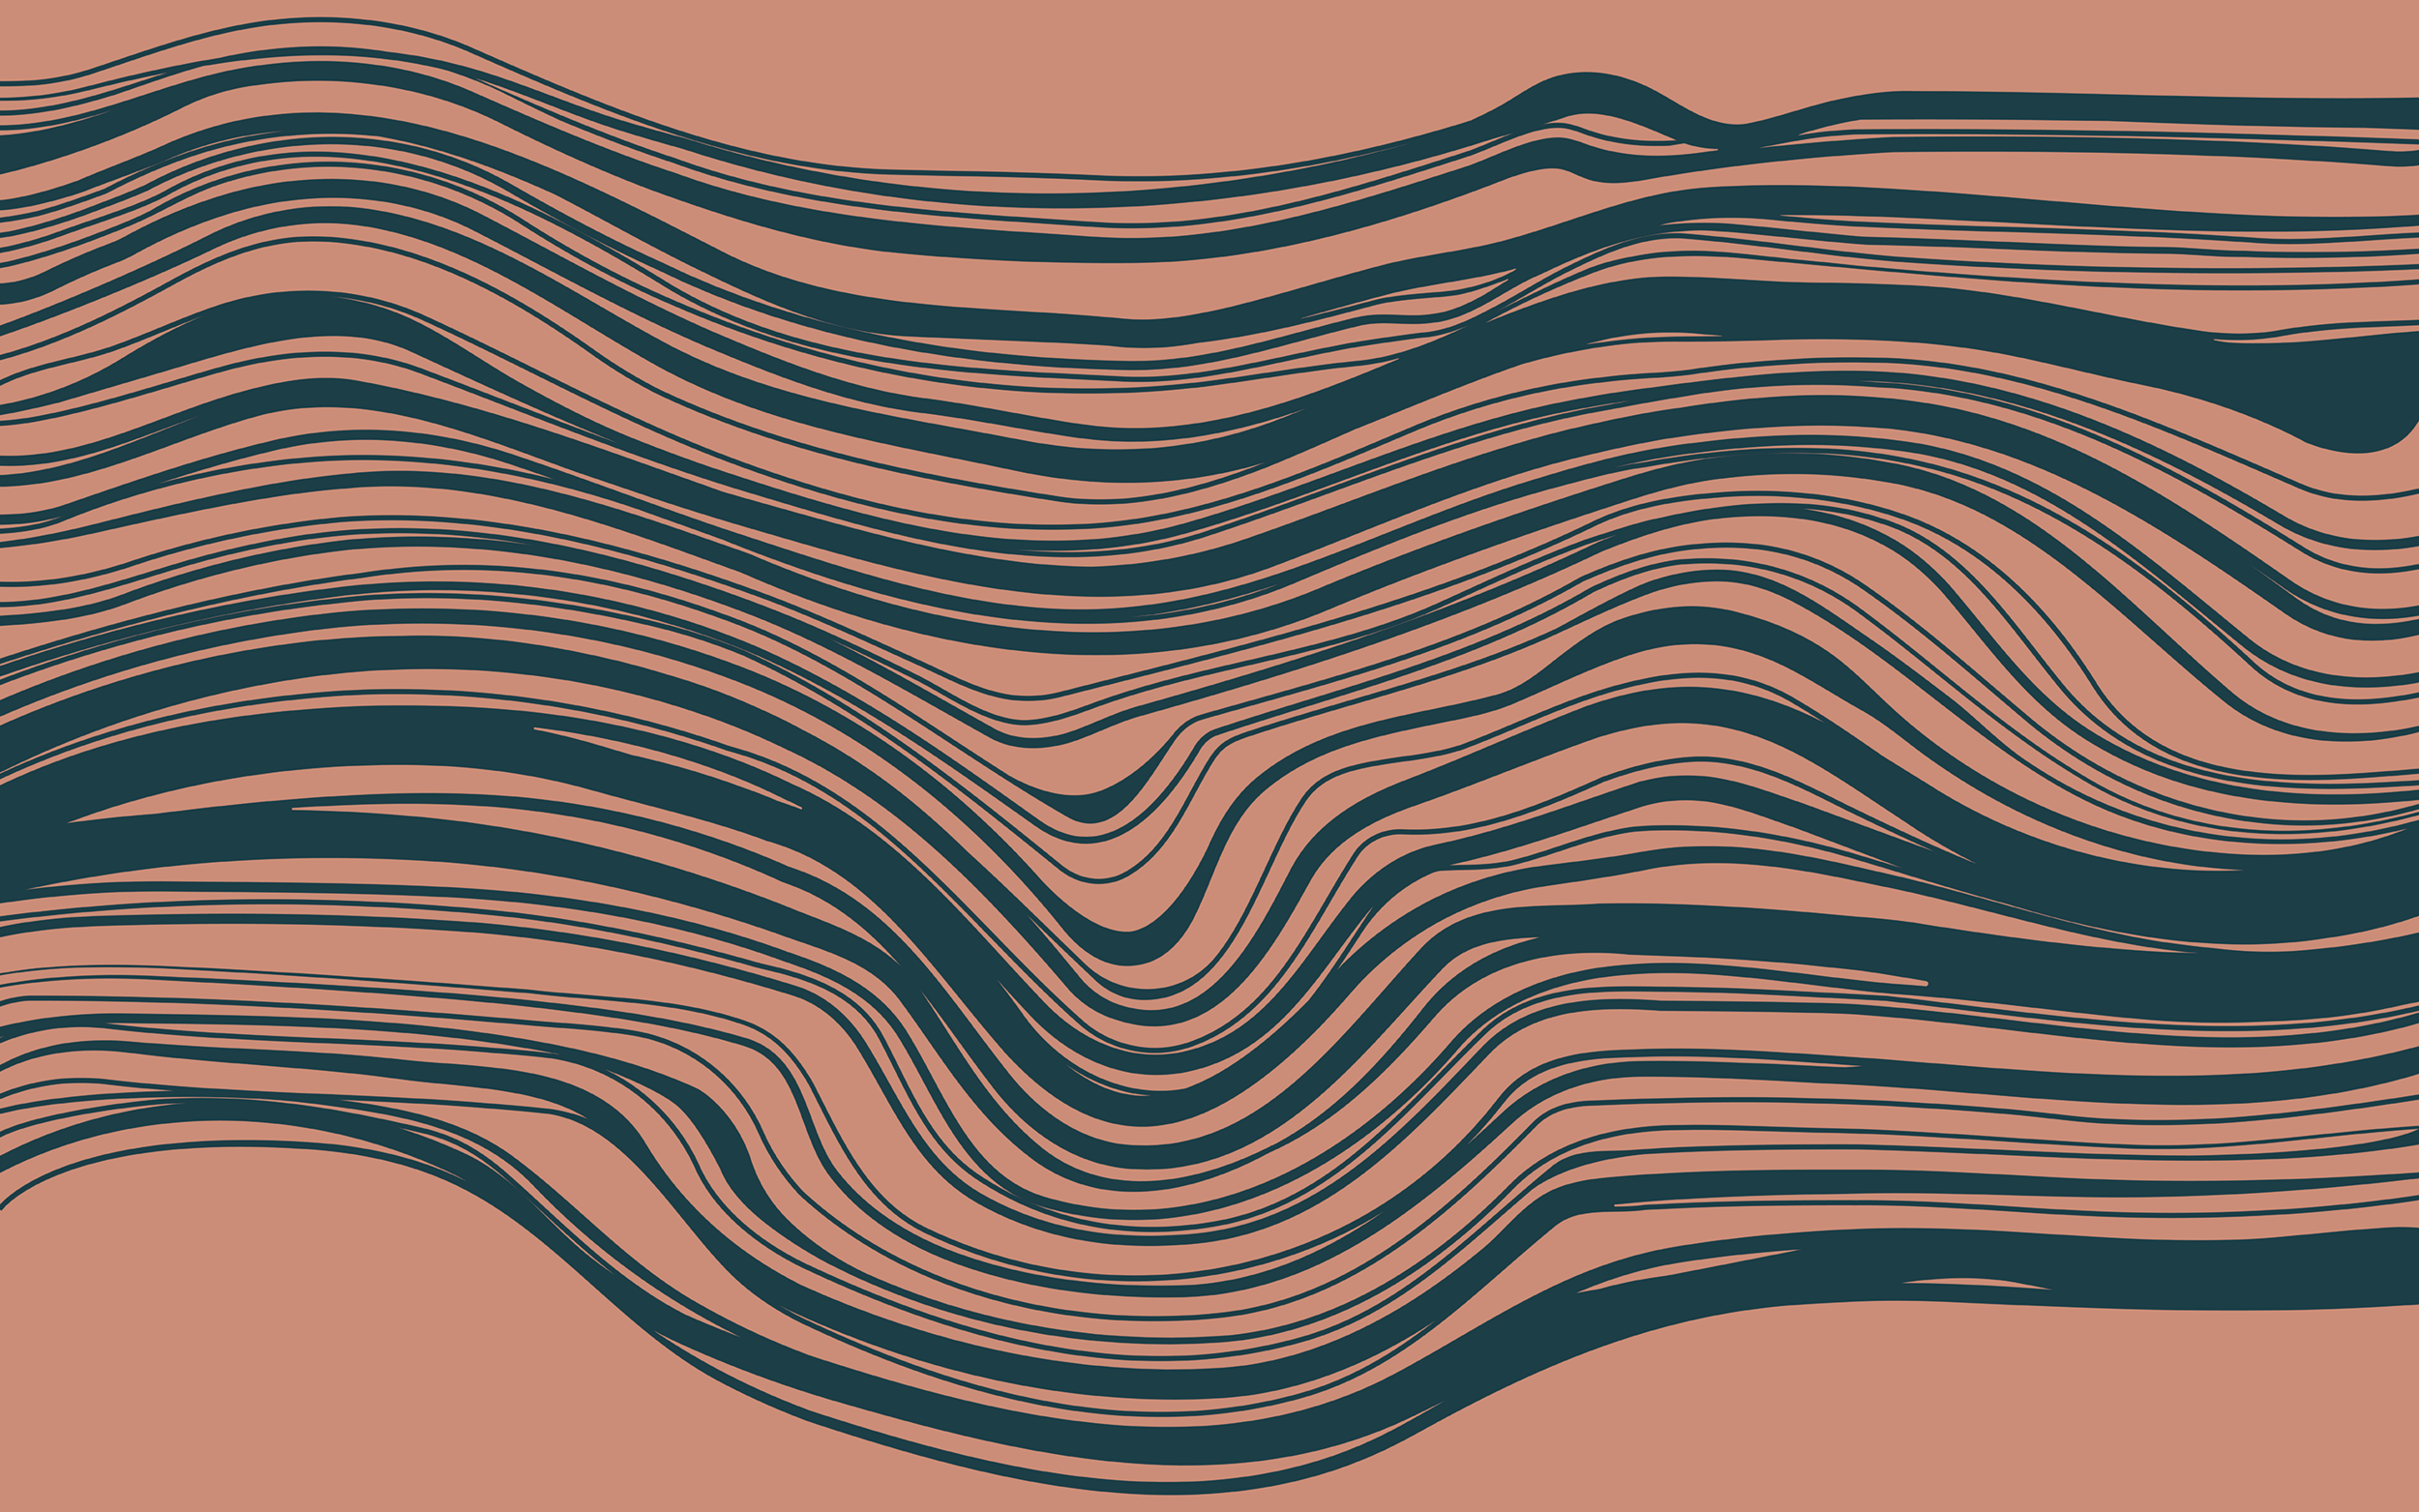 WildManor_Pattern_Final-05_LOW.png